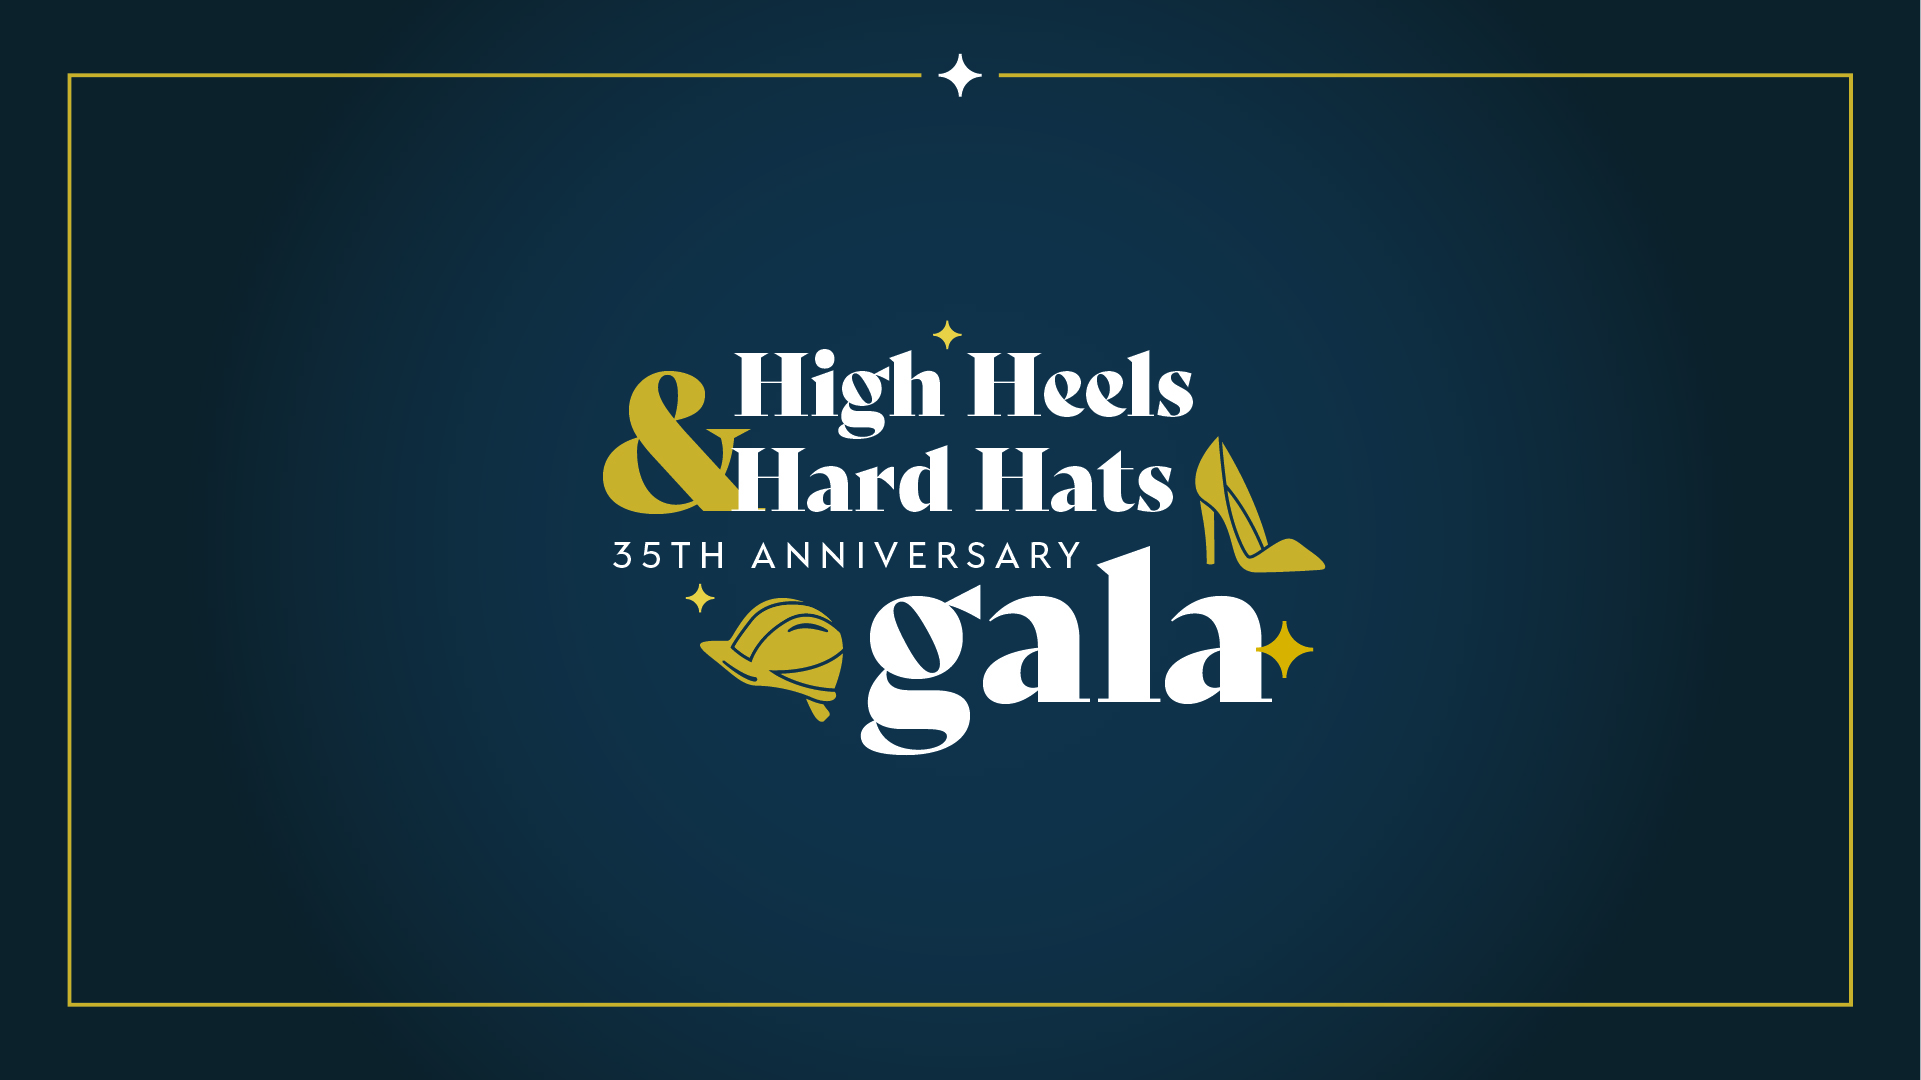 High Heels & Hard Hats main logo